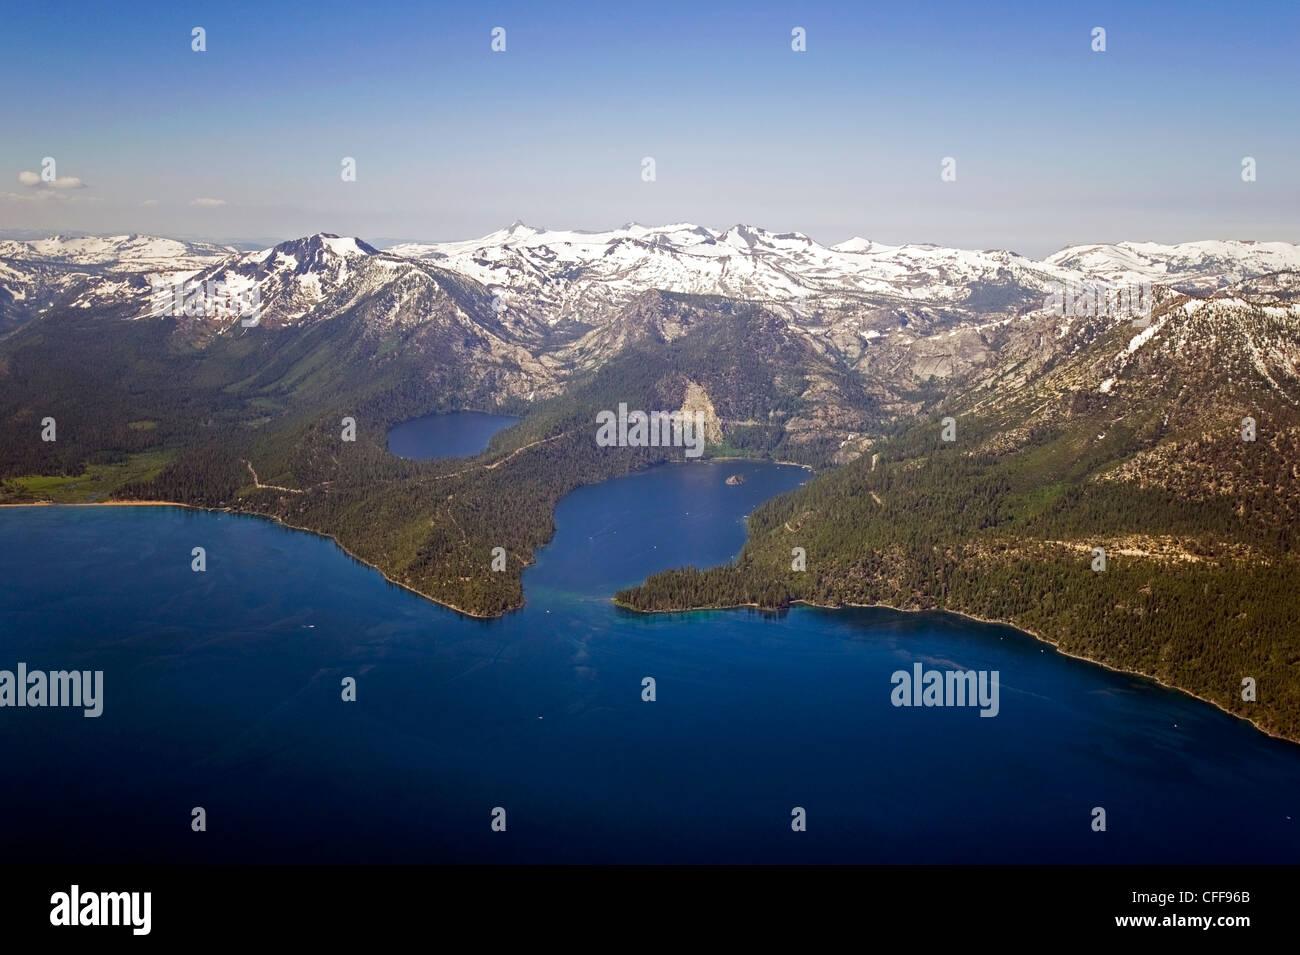 Photograph immagini photograph fotos stock alamy for Cabina nel noleggio lago tahoe